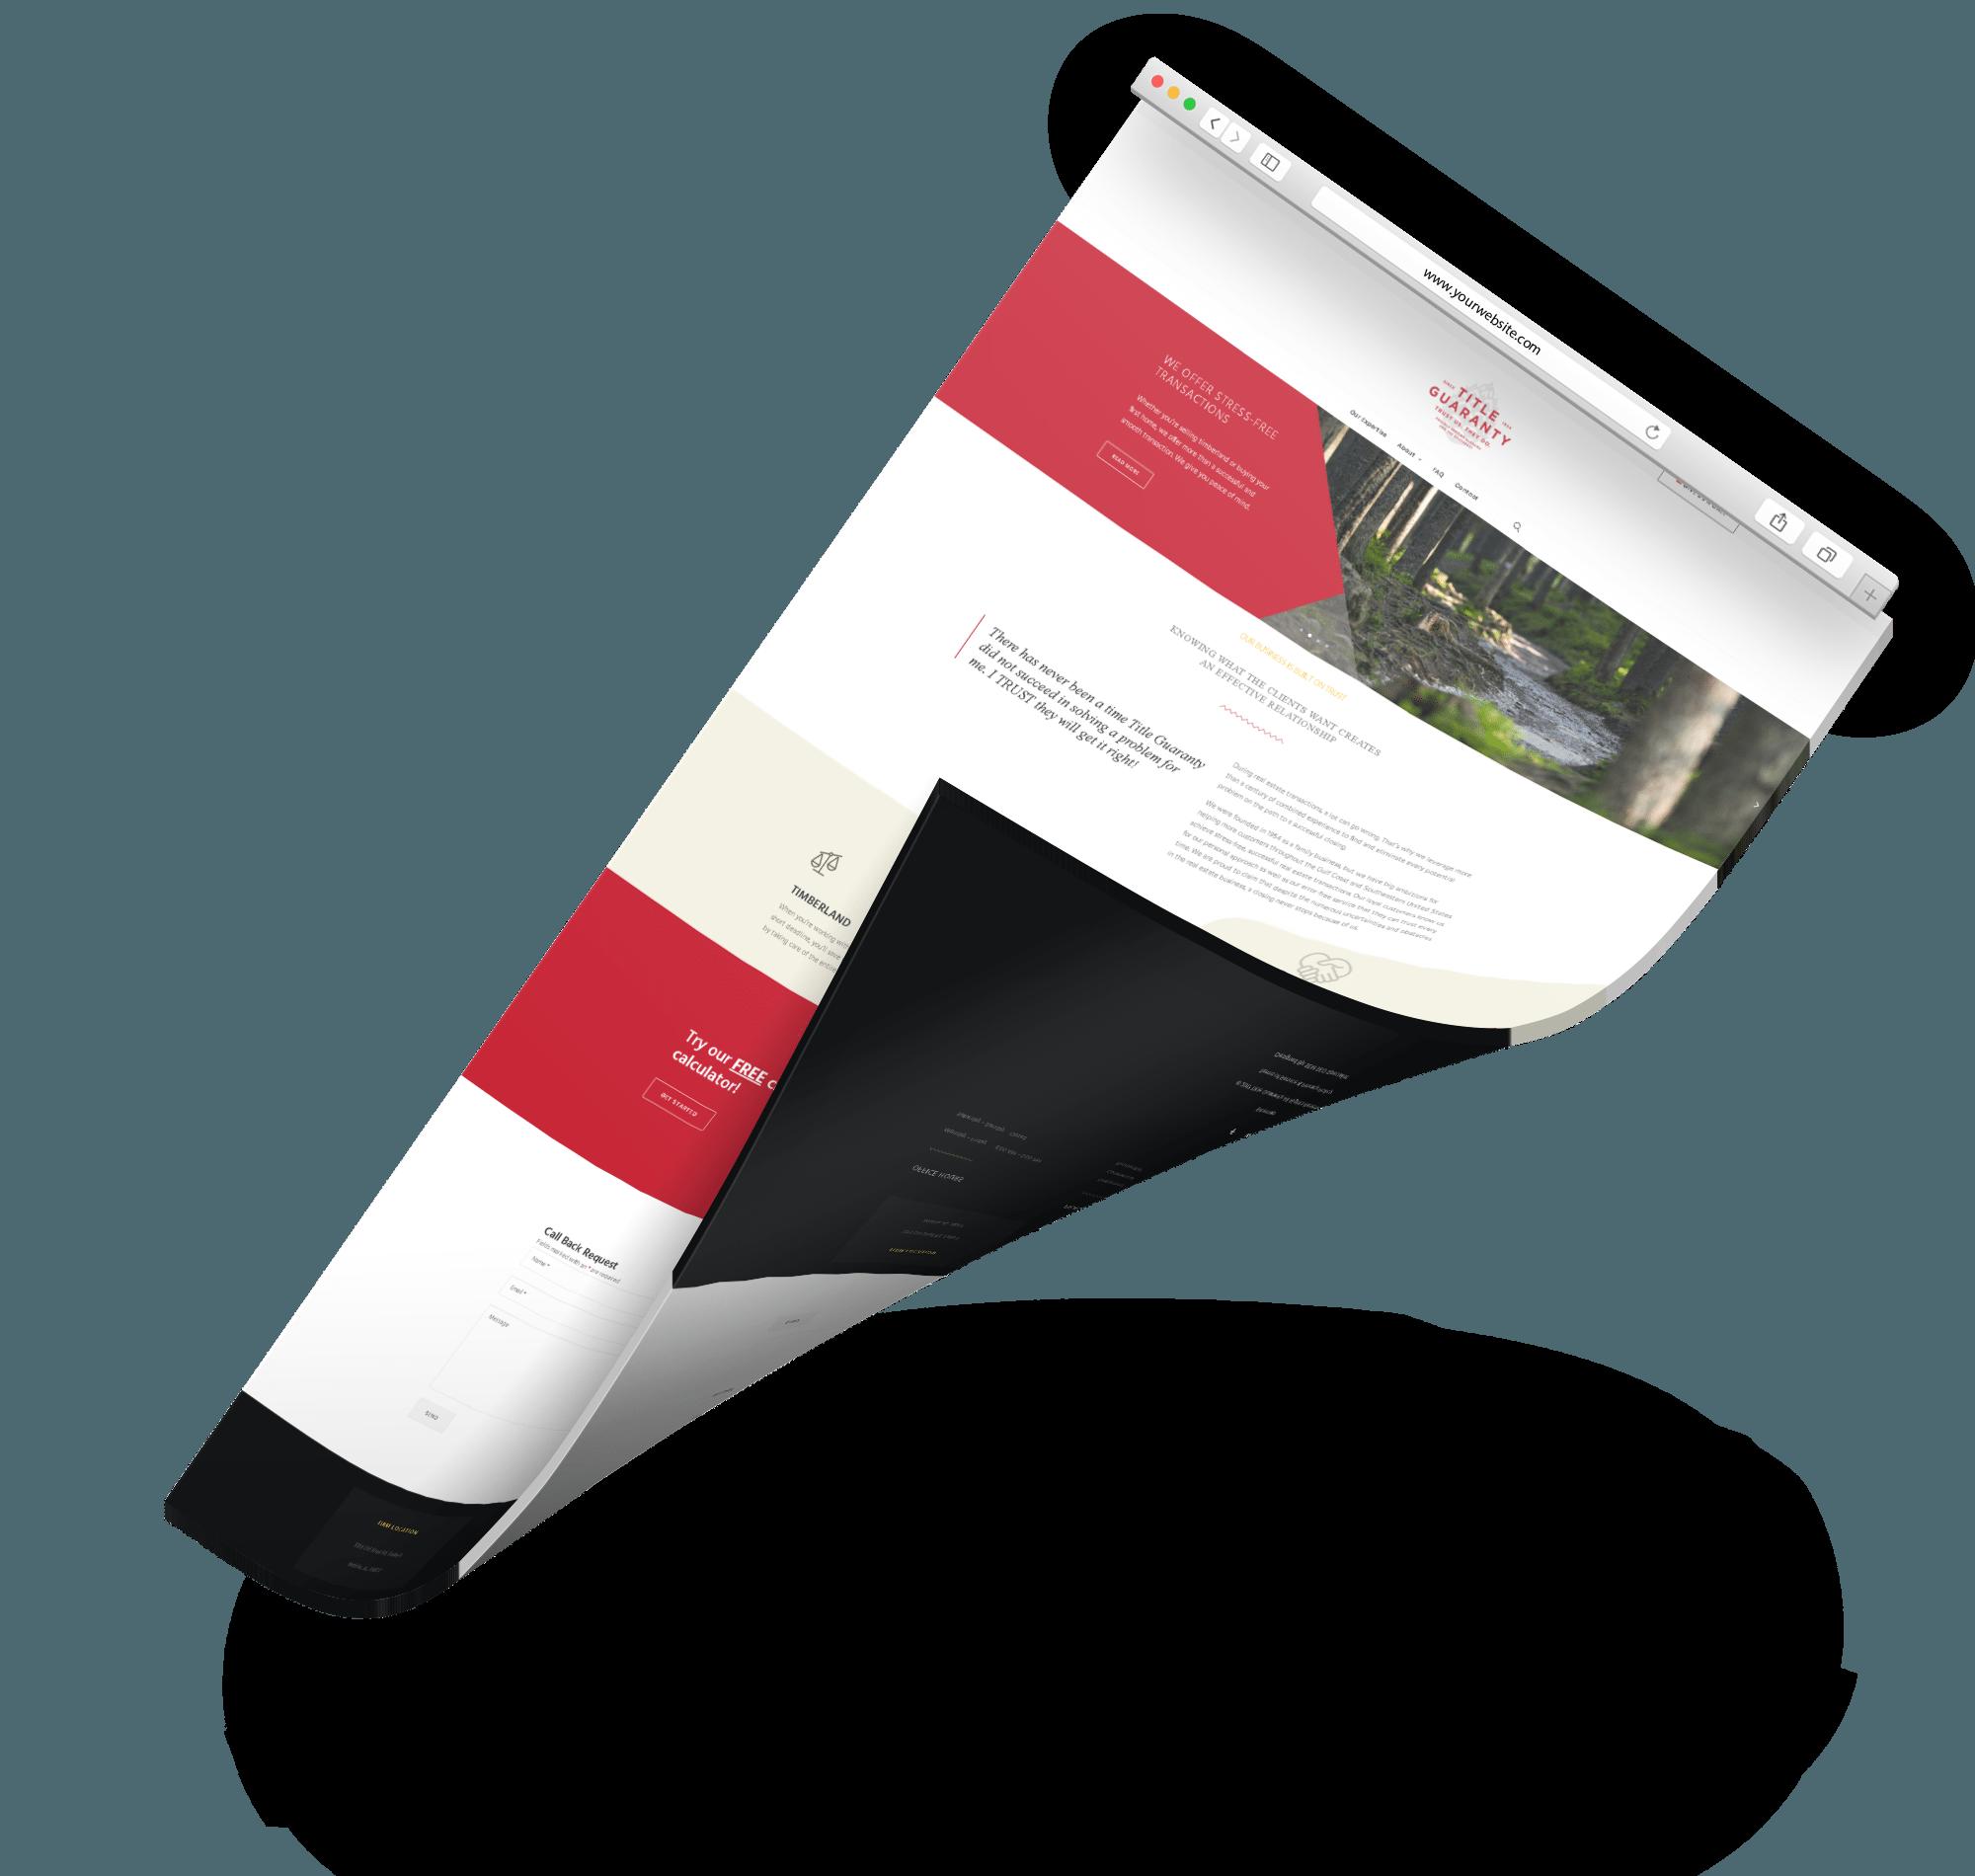 Title Guaranty web design sem seo specialist